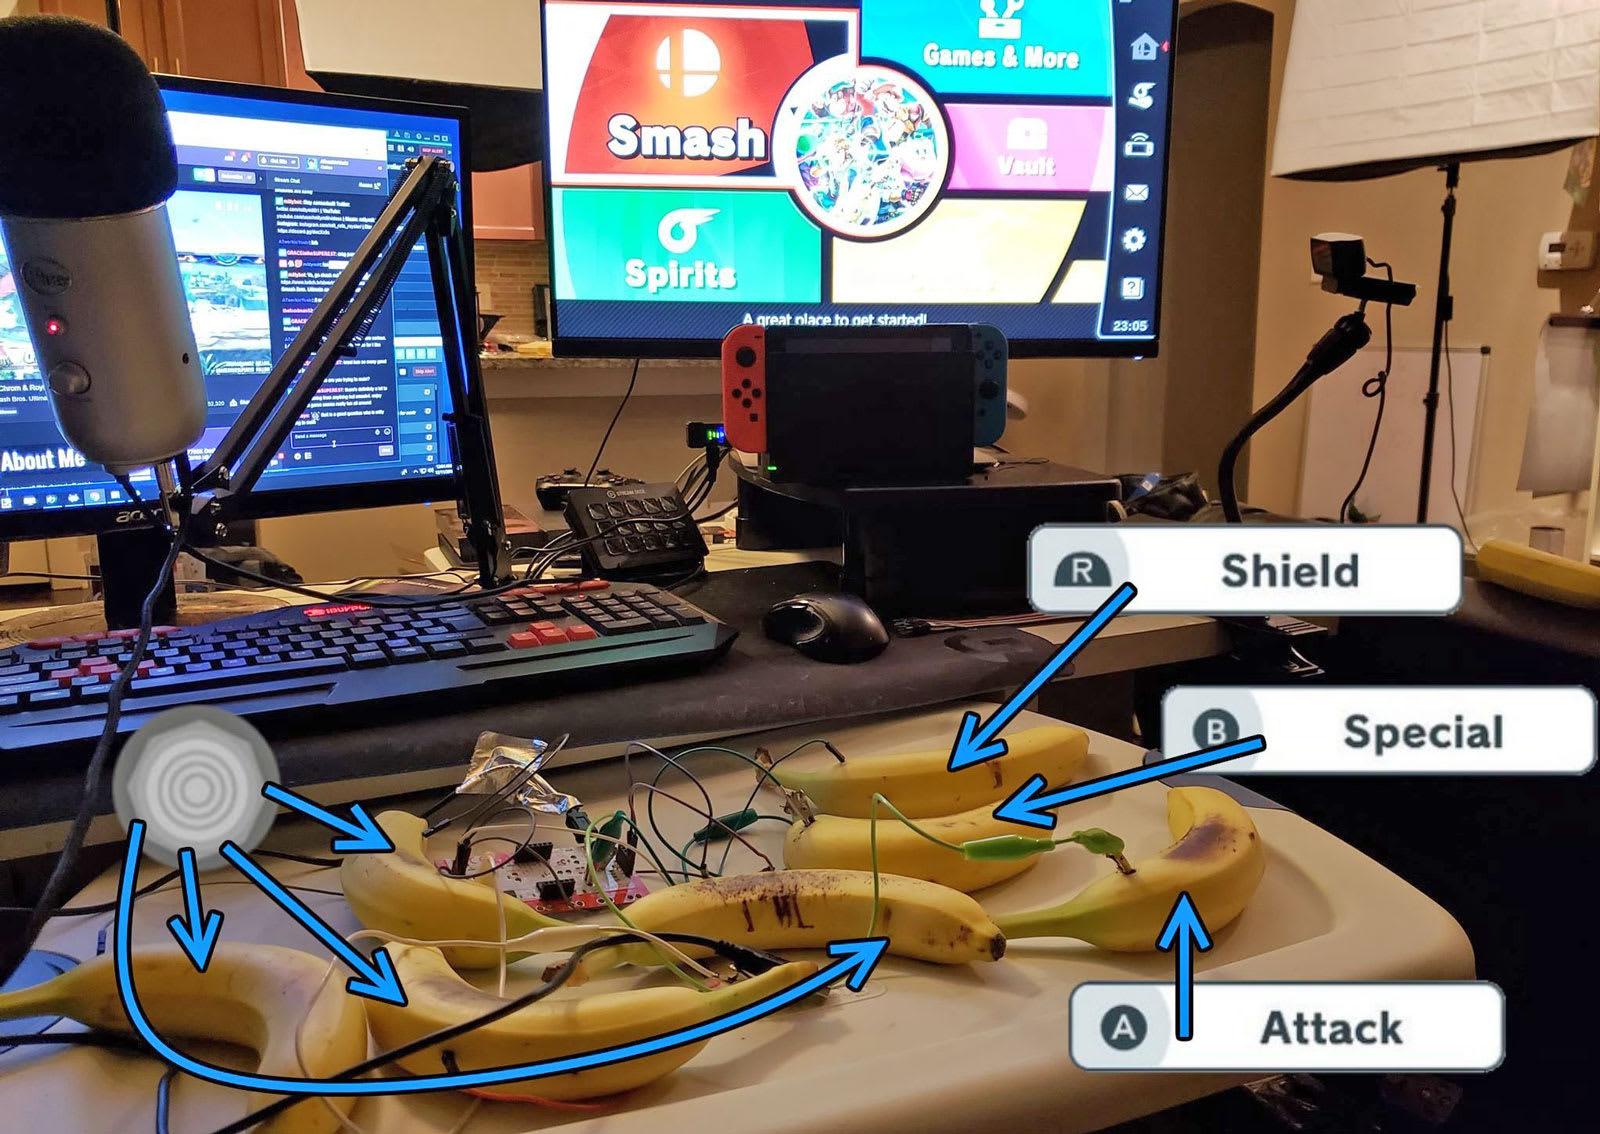 You can play 'Super Smash Bros  Ultimate' with banana